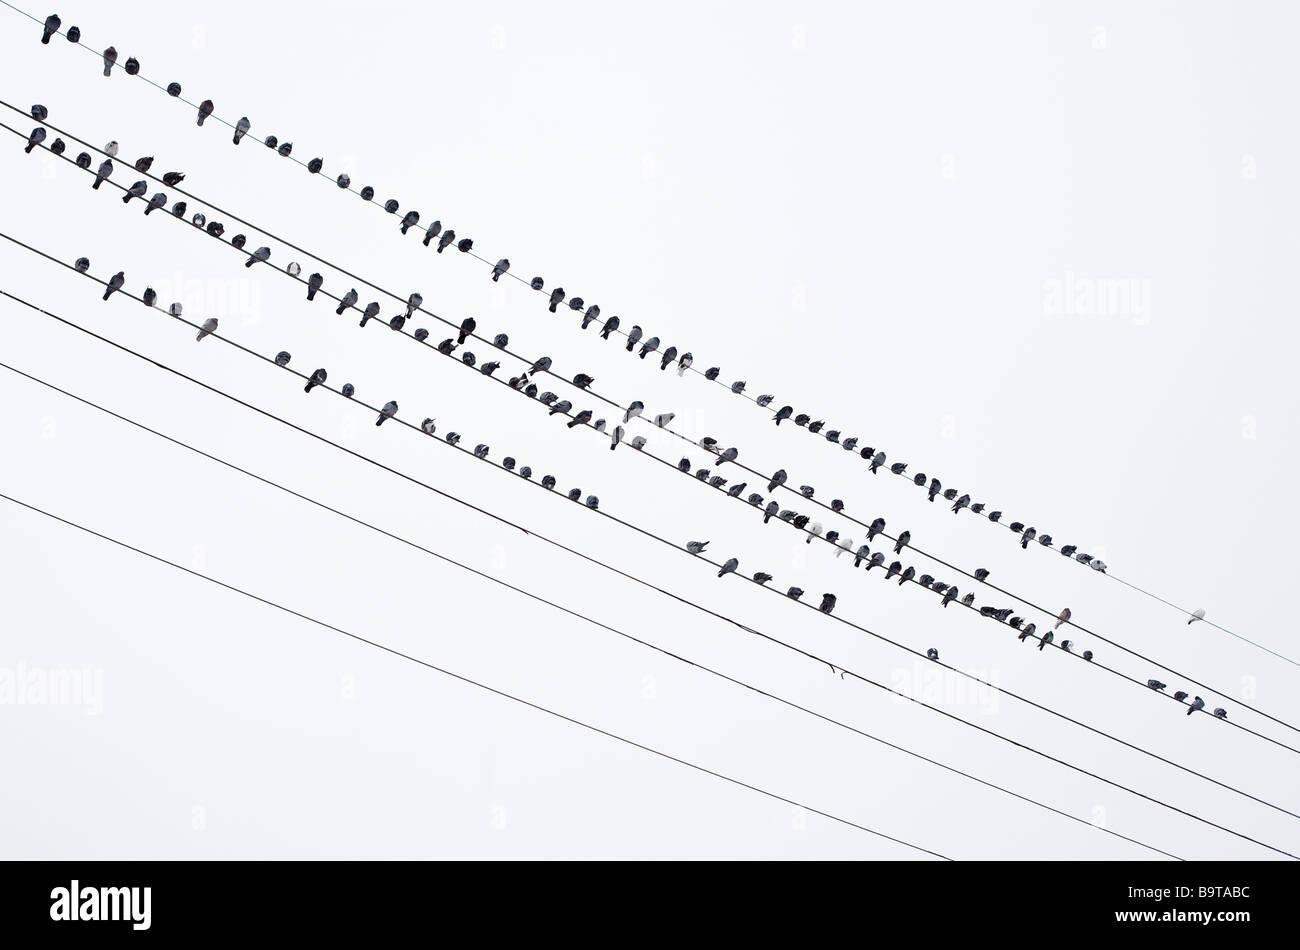 Birds on Wires. A large flock of dark birds arranged into four rows leaving three wires bird free. Ottawa, Ontario, - Stock Image